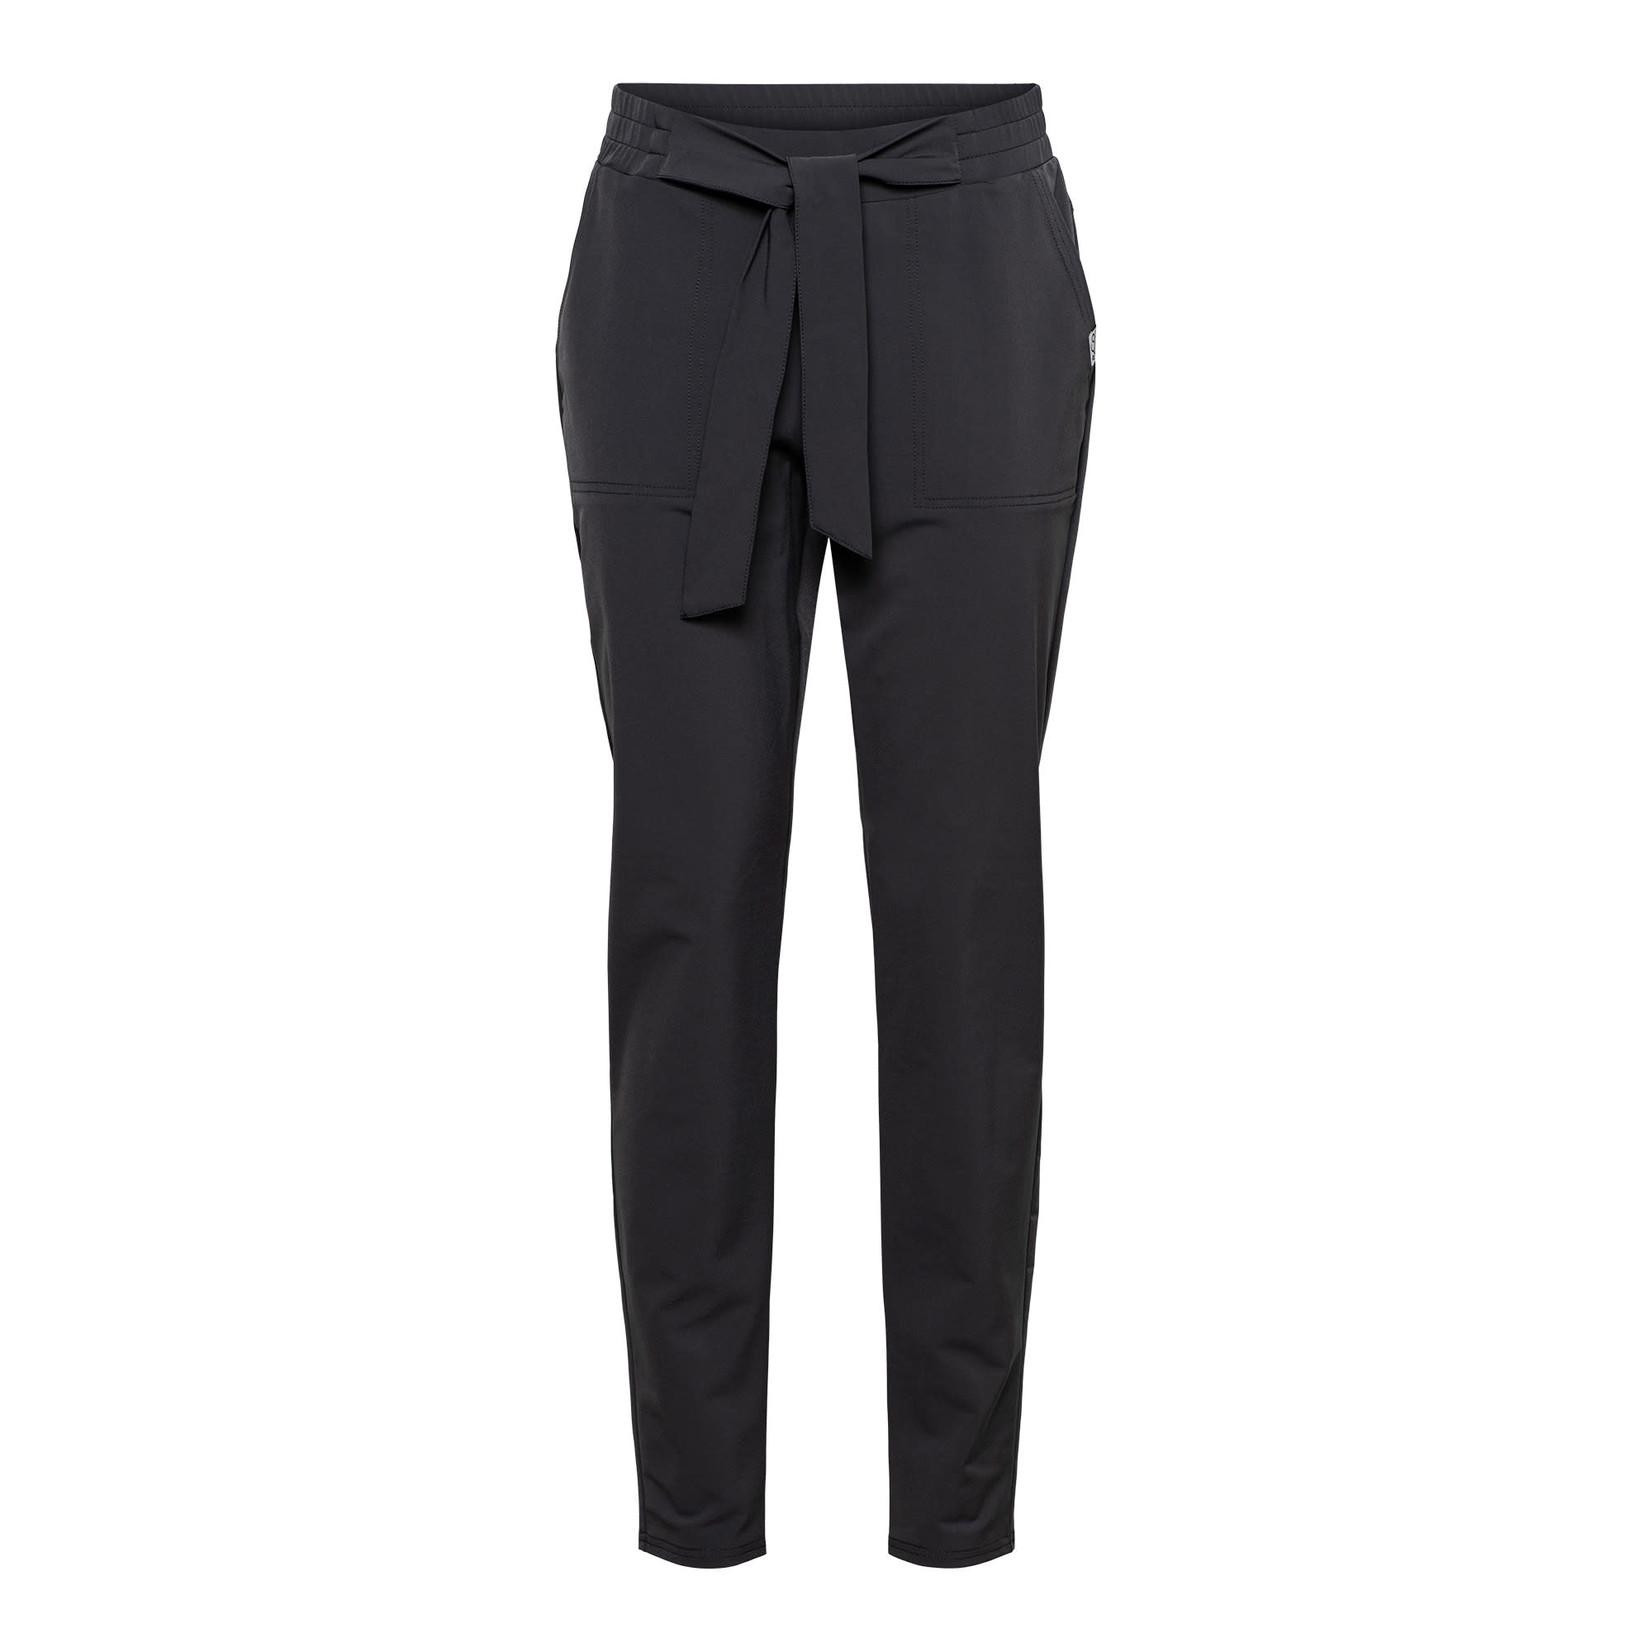 & Co Woman & Co Poppy Knot Pants Off Black